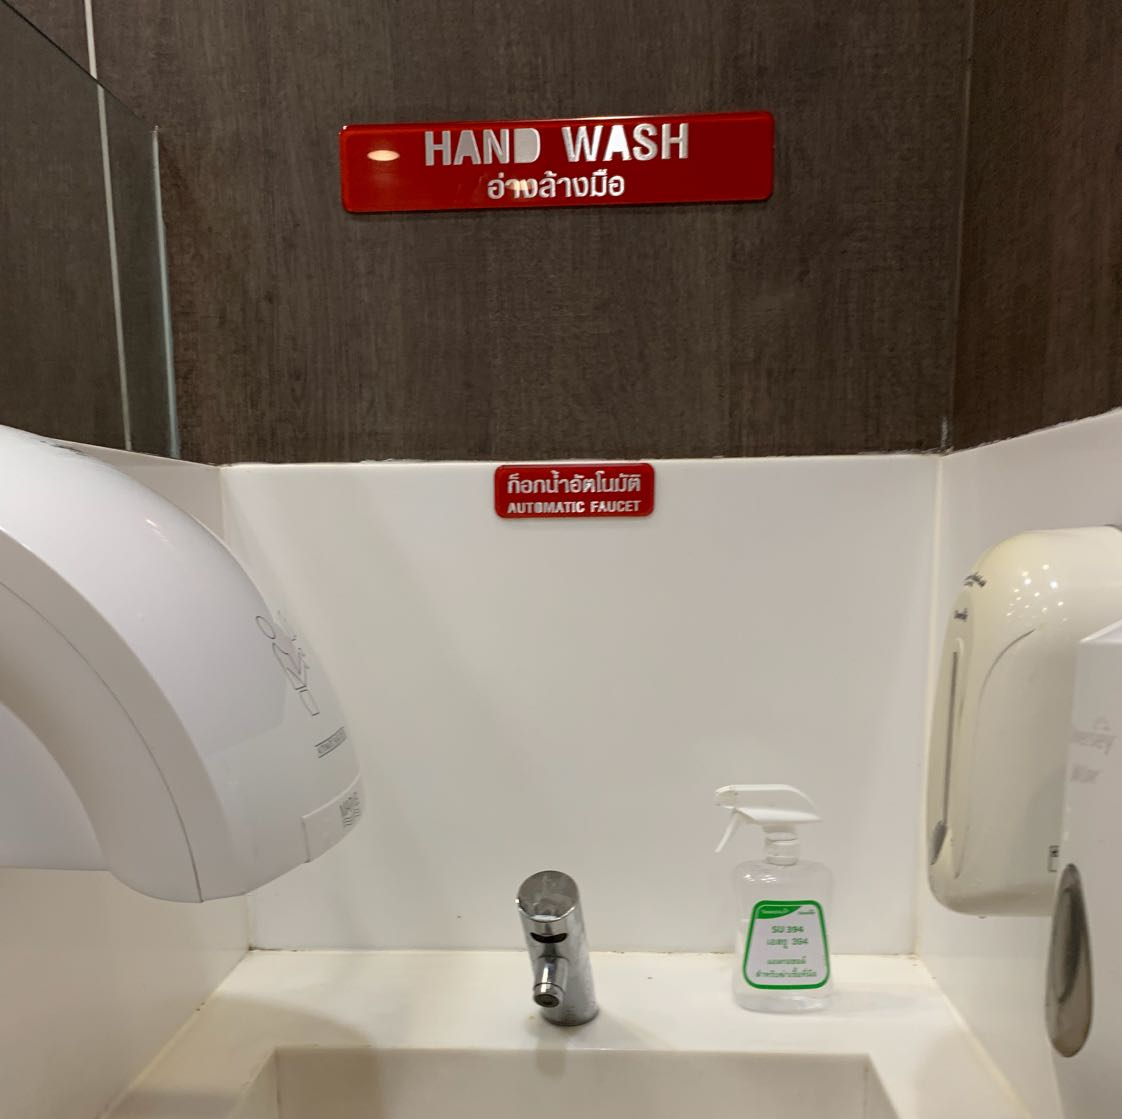 Ini bukan toilet, tetapi tempat cuci tangan yang dilengkapi dengan sabun, alkohol untuk mencuci tangan, dan pengering tangan. Biasanya ada di sekitar toilet sih. Namanya Wash Basin. Kita nemu ini di KFC deket SFCinema, MBK, Bangkok.